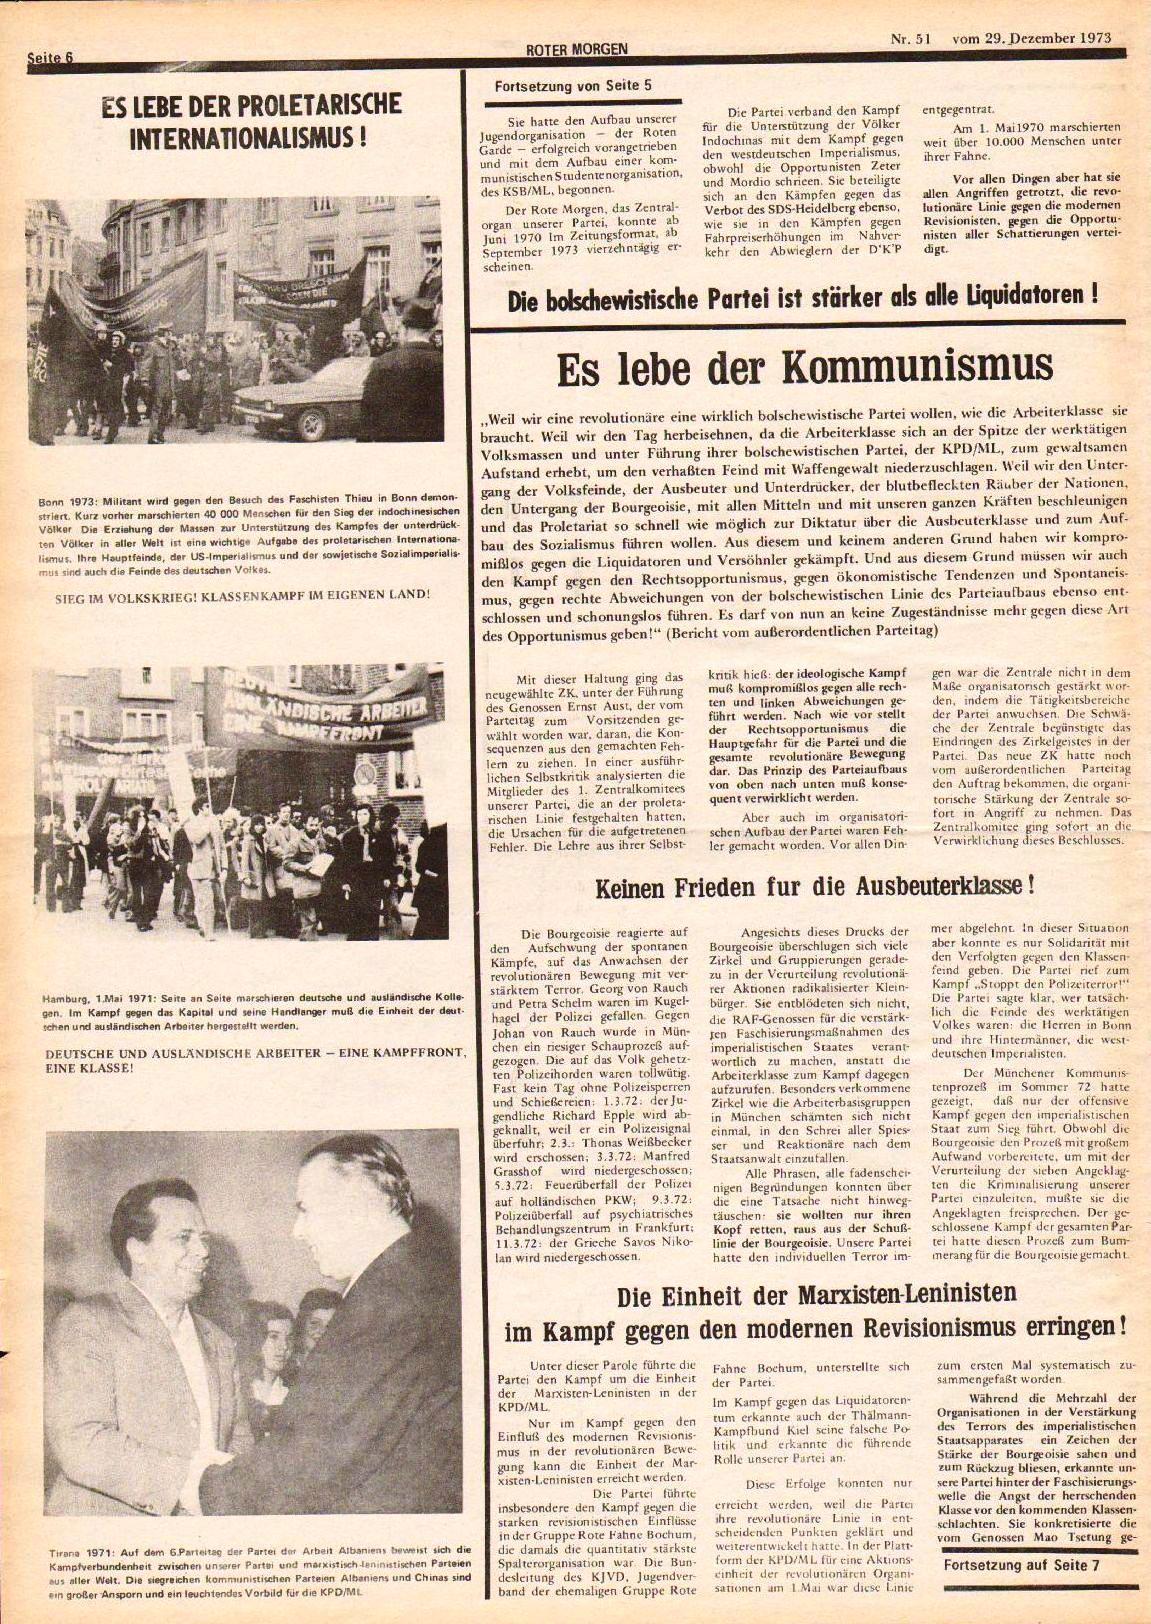 Roter Morgen, 7. Jg., 29. Dezember 1973, Nr. 51, Seite 6